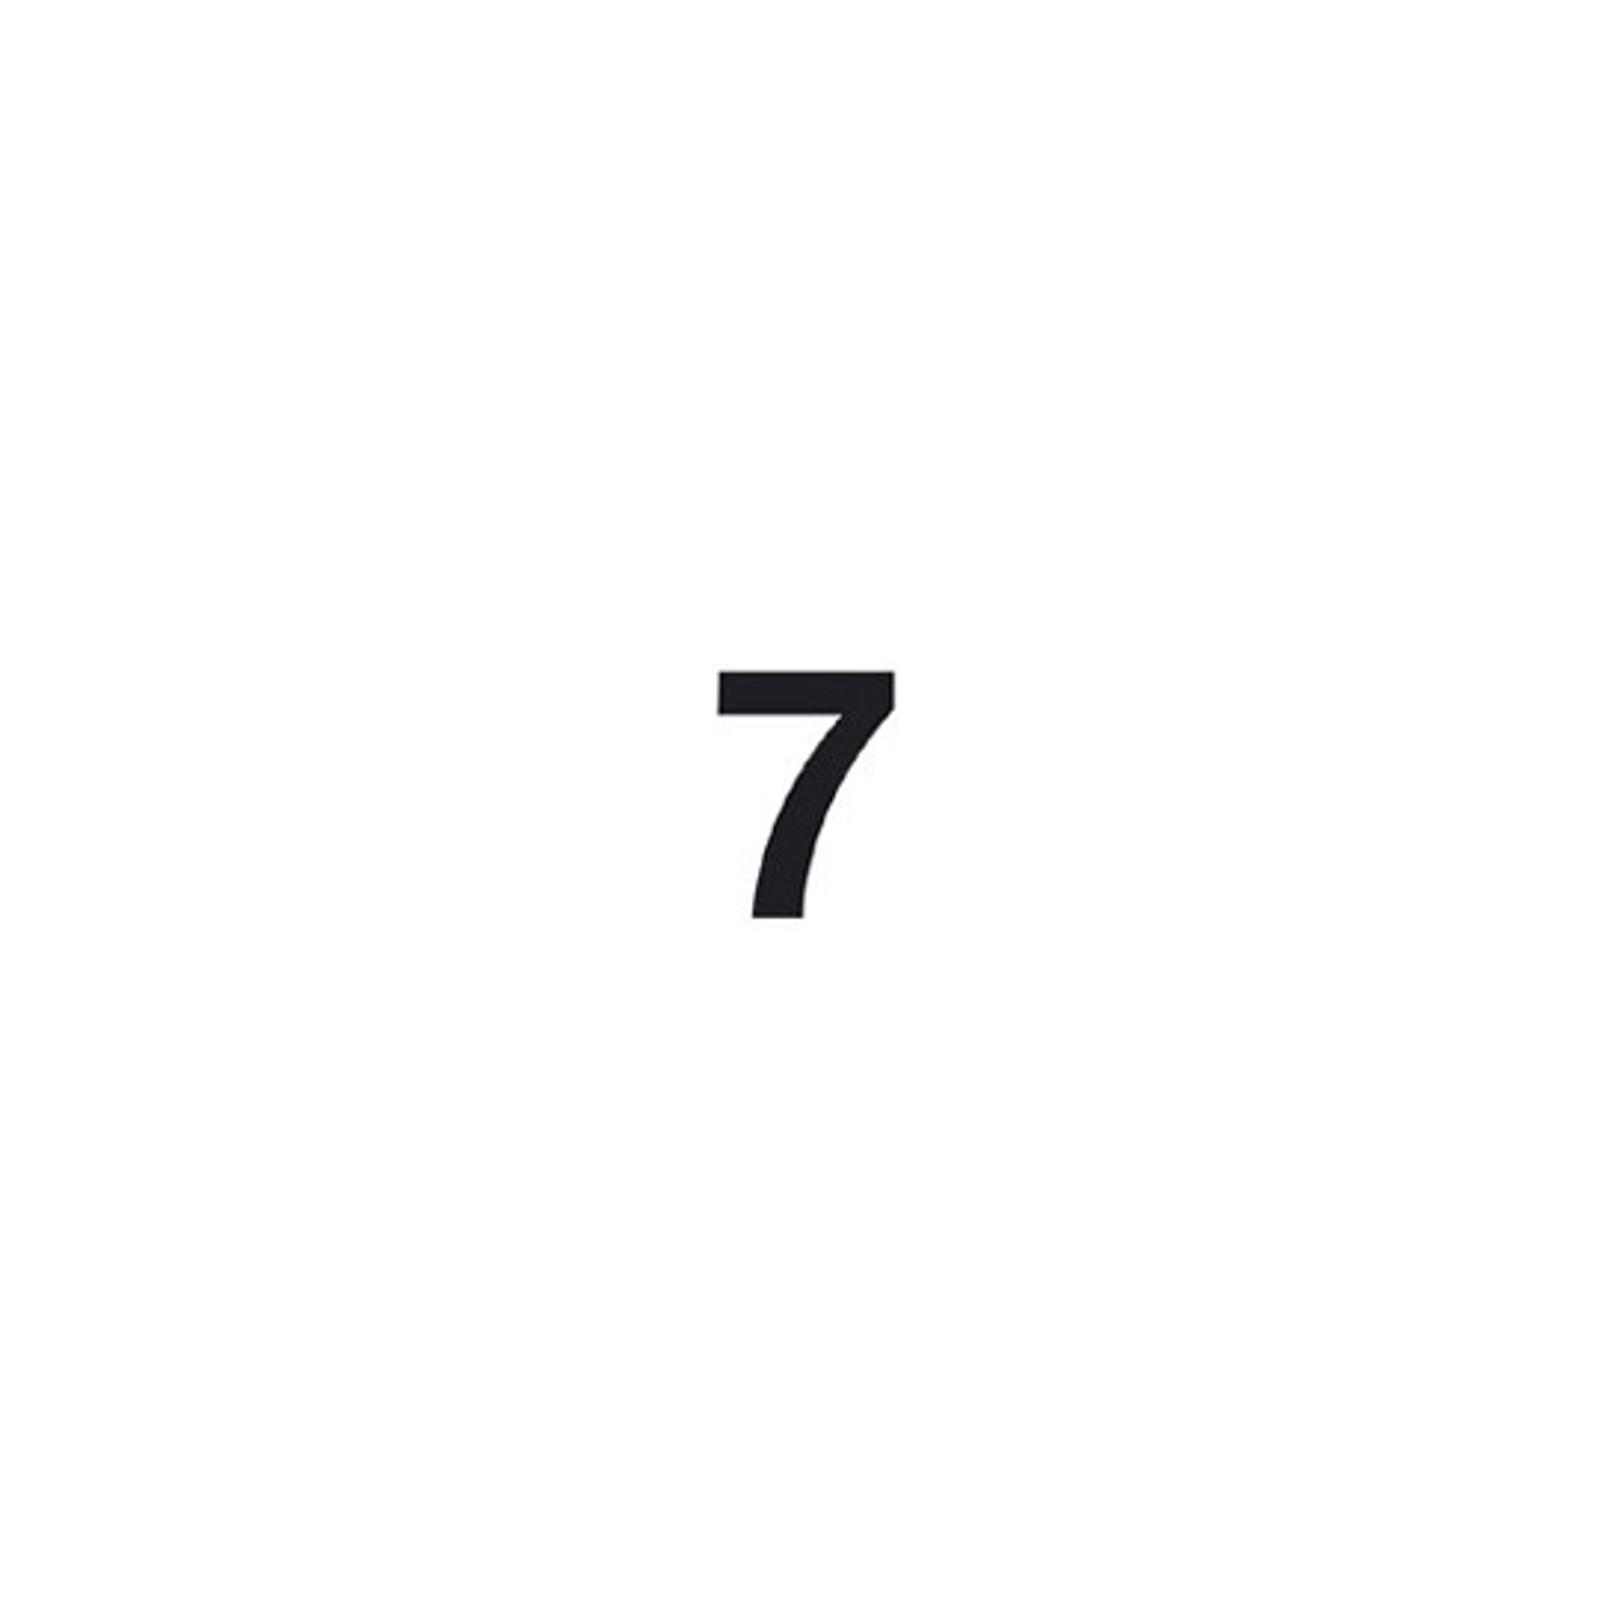 Cifra autoadesiva 7